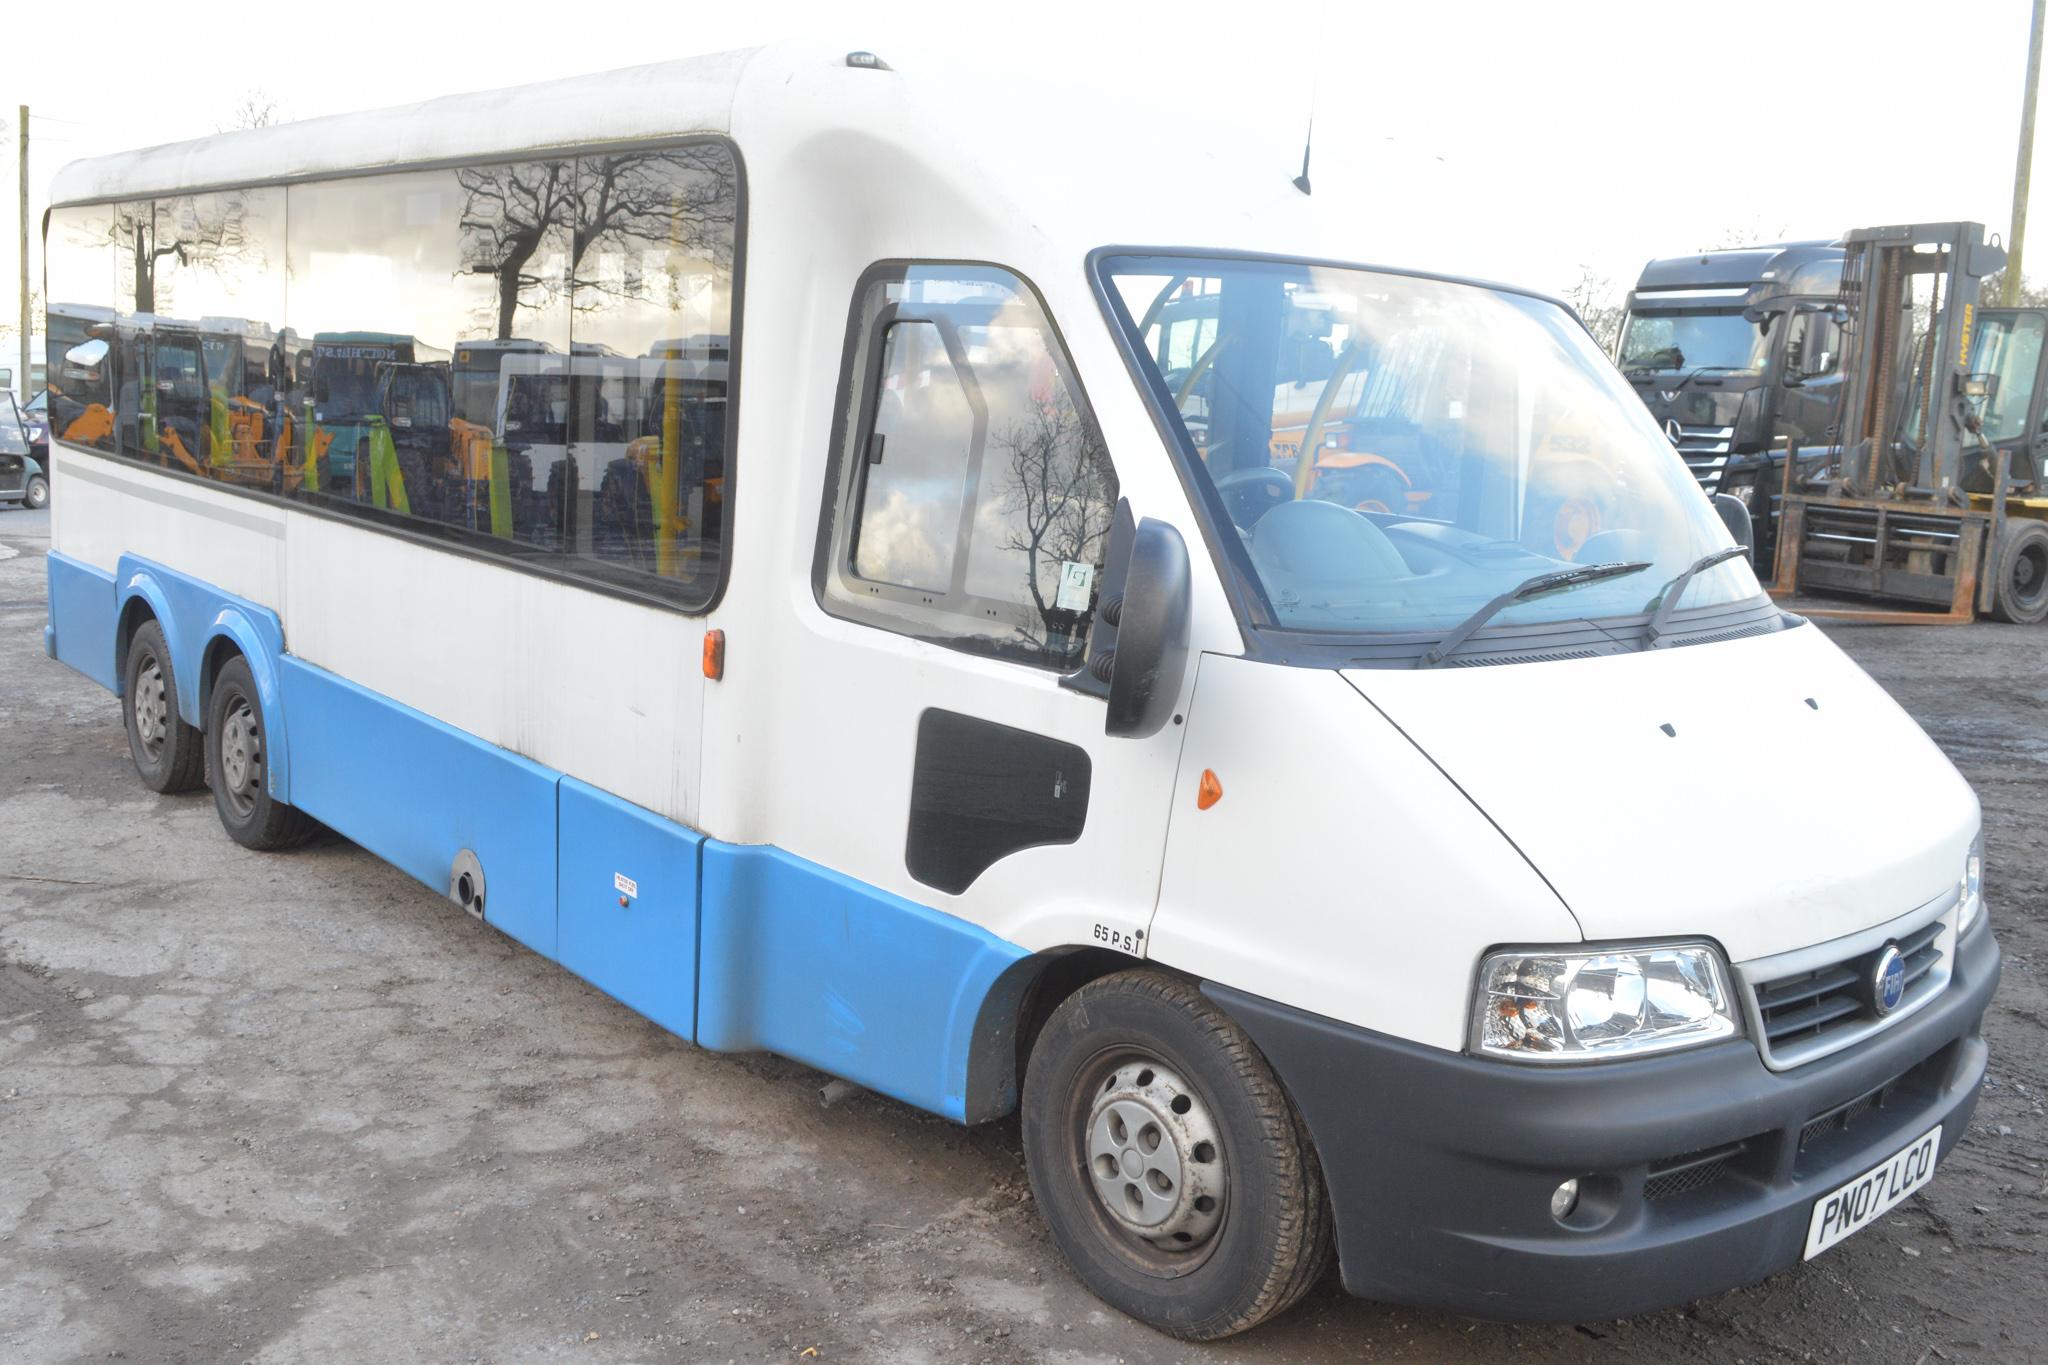 Lot 57 - Fiat Ducato 14 seat minibus Registration Number: PN07 LCO Date of Registration: 01/07 MOT: Expired